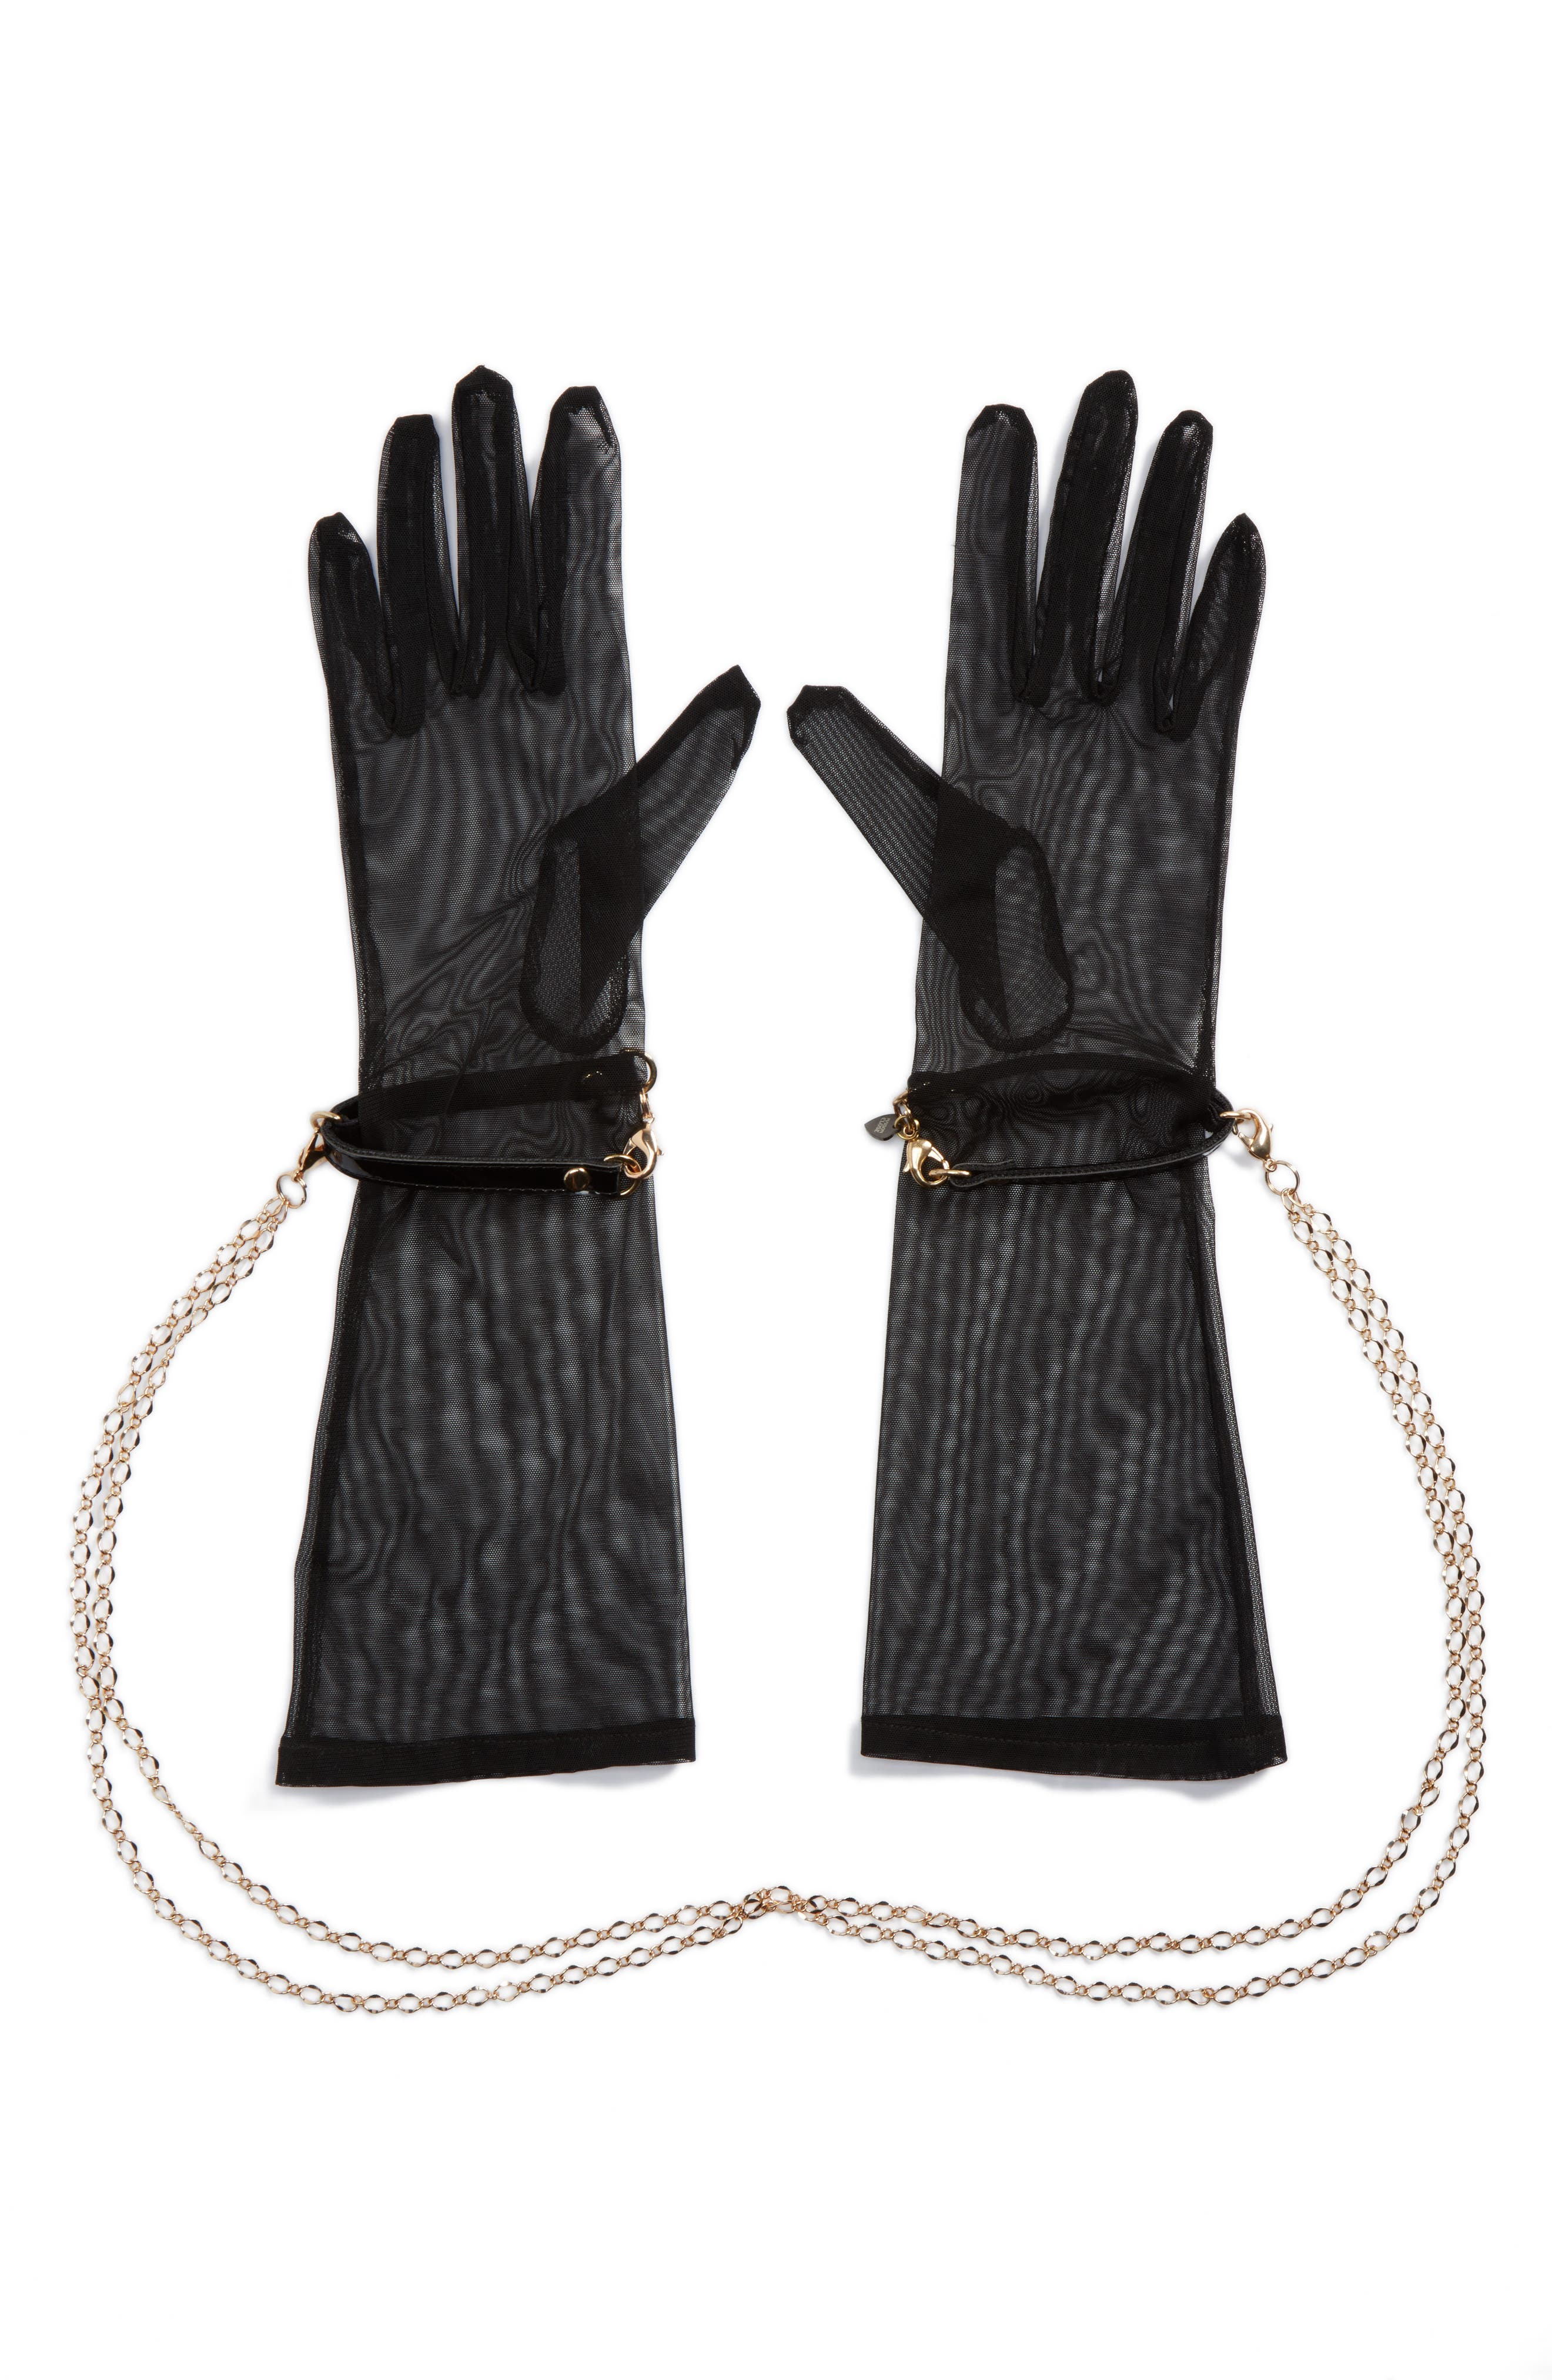 x Fräulein Kink Sheer Gloves,                             Main thumbnail 1, color,                             Black